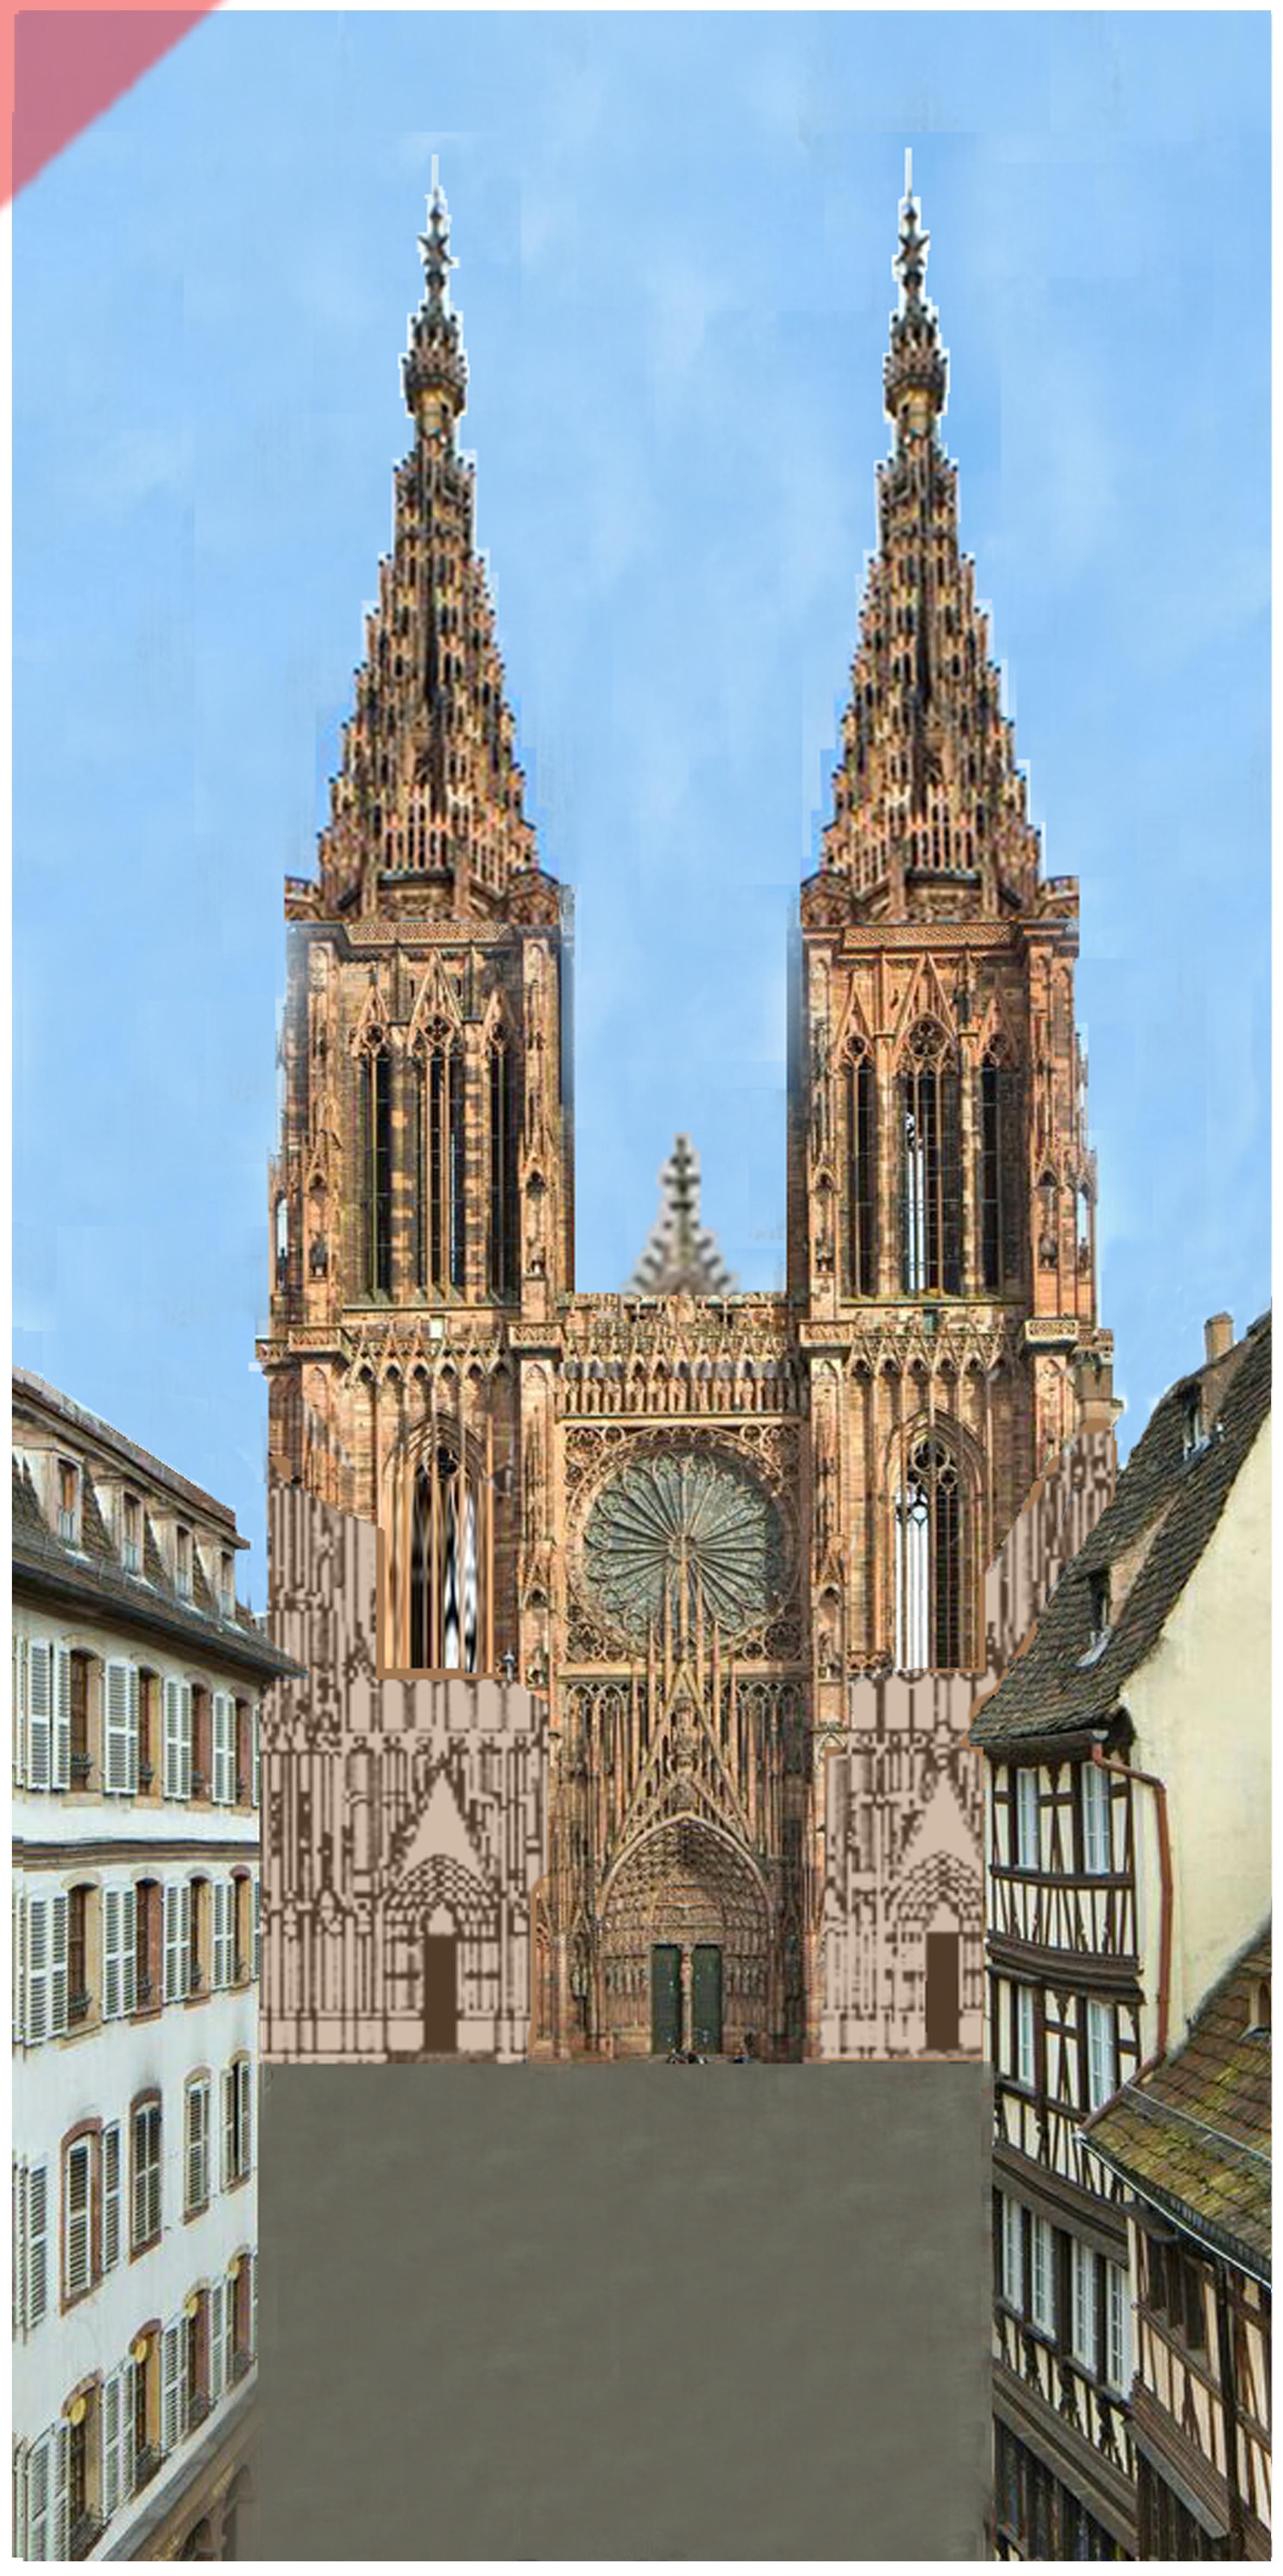 Strassburg-Münster-Cathédrale-tours-2-deux-prévu-toit-de-pierre-façade-ouest-Straßburg-cathedrale-2-two-towers-kathedrale-pitched-roof-stone-then-and-now